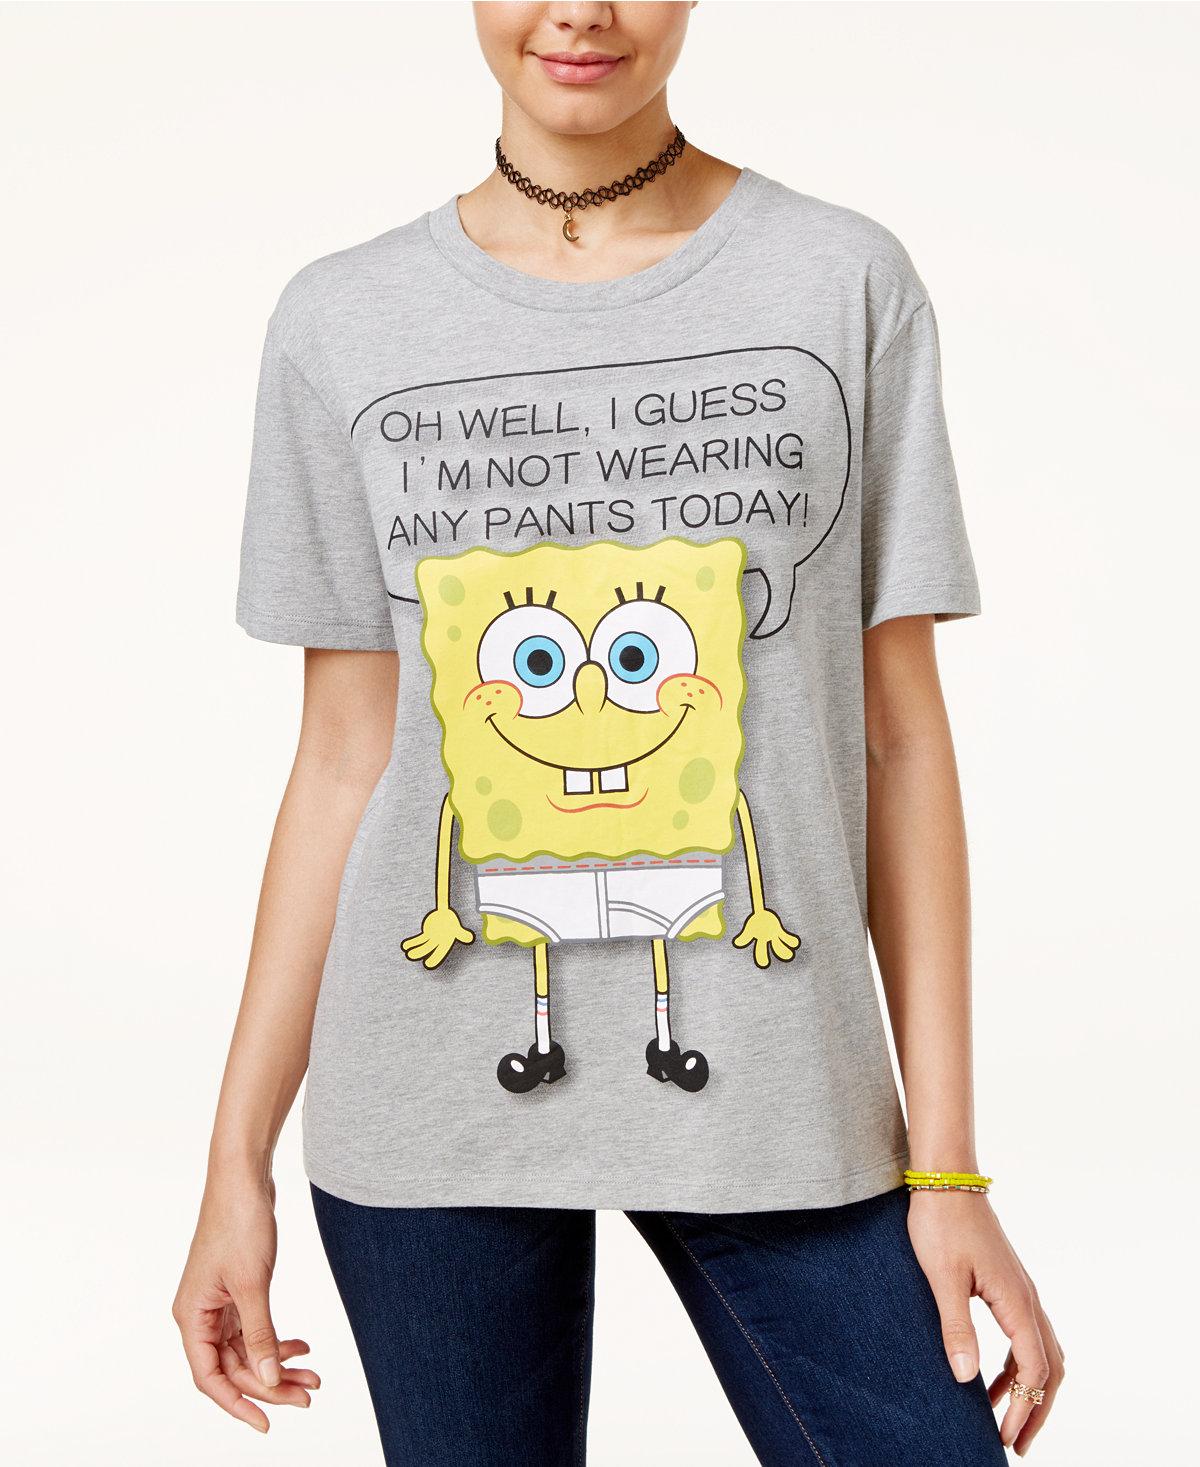 spongebob.jpeg